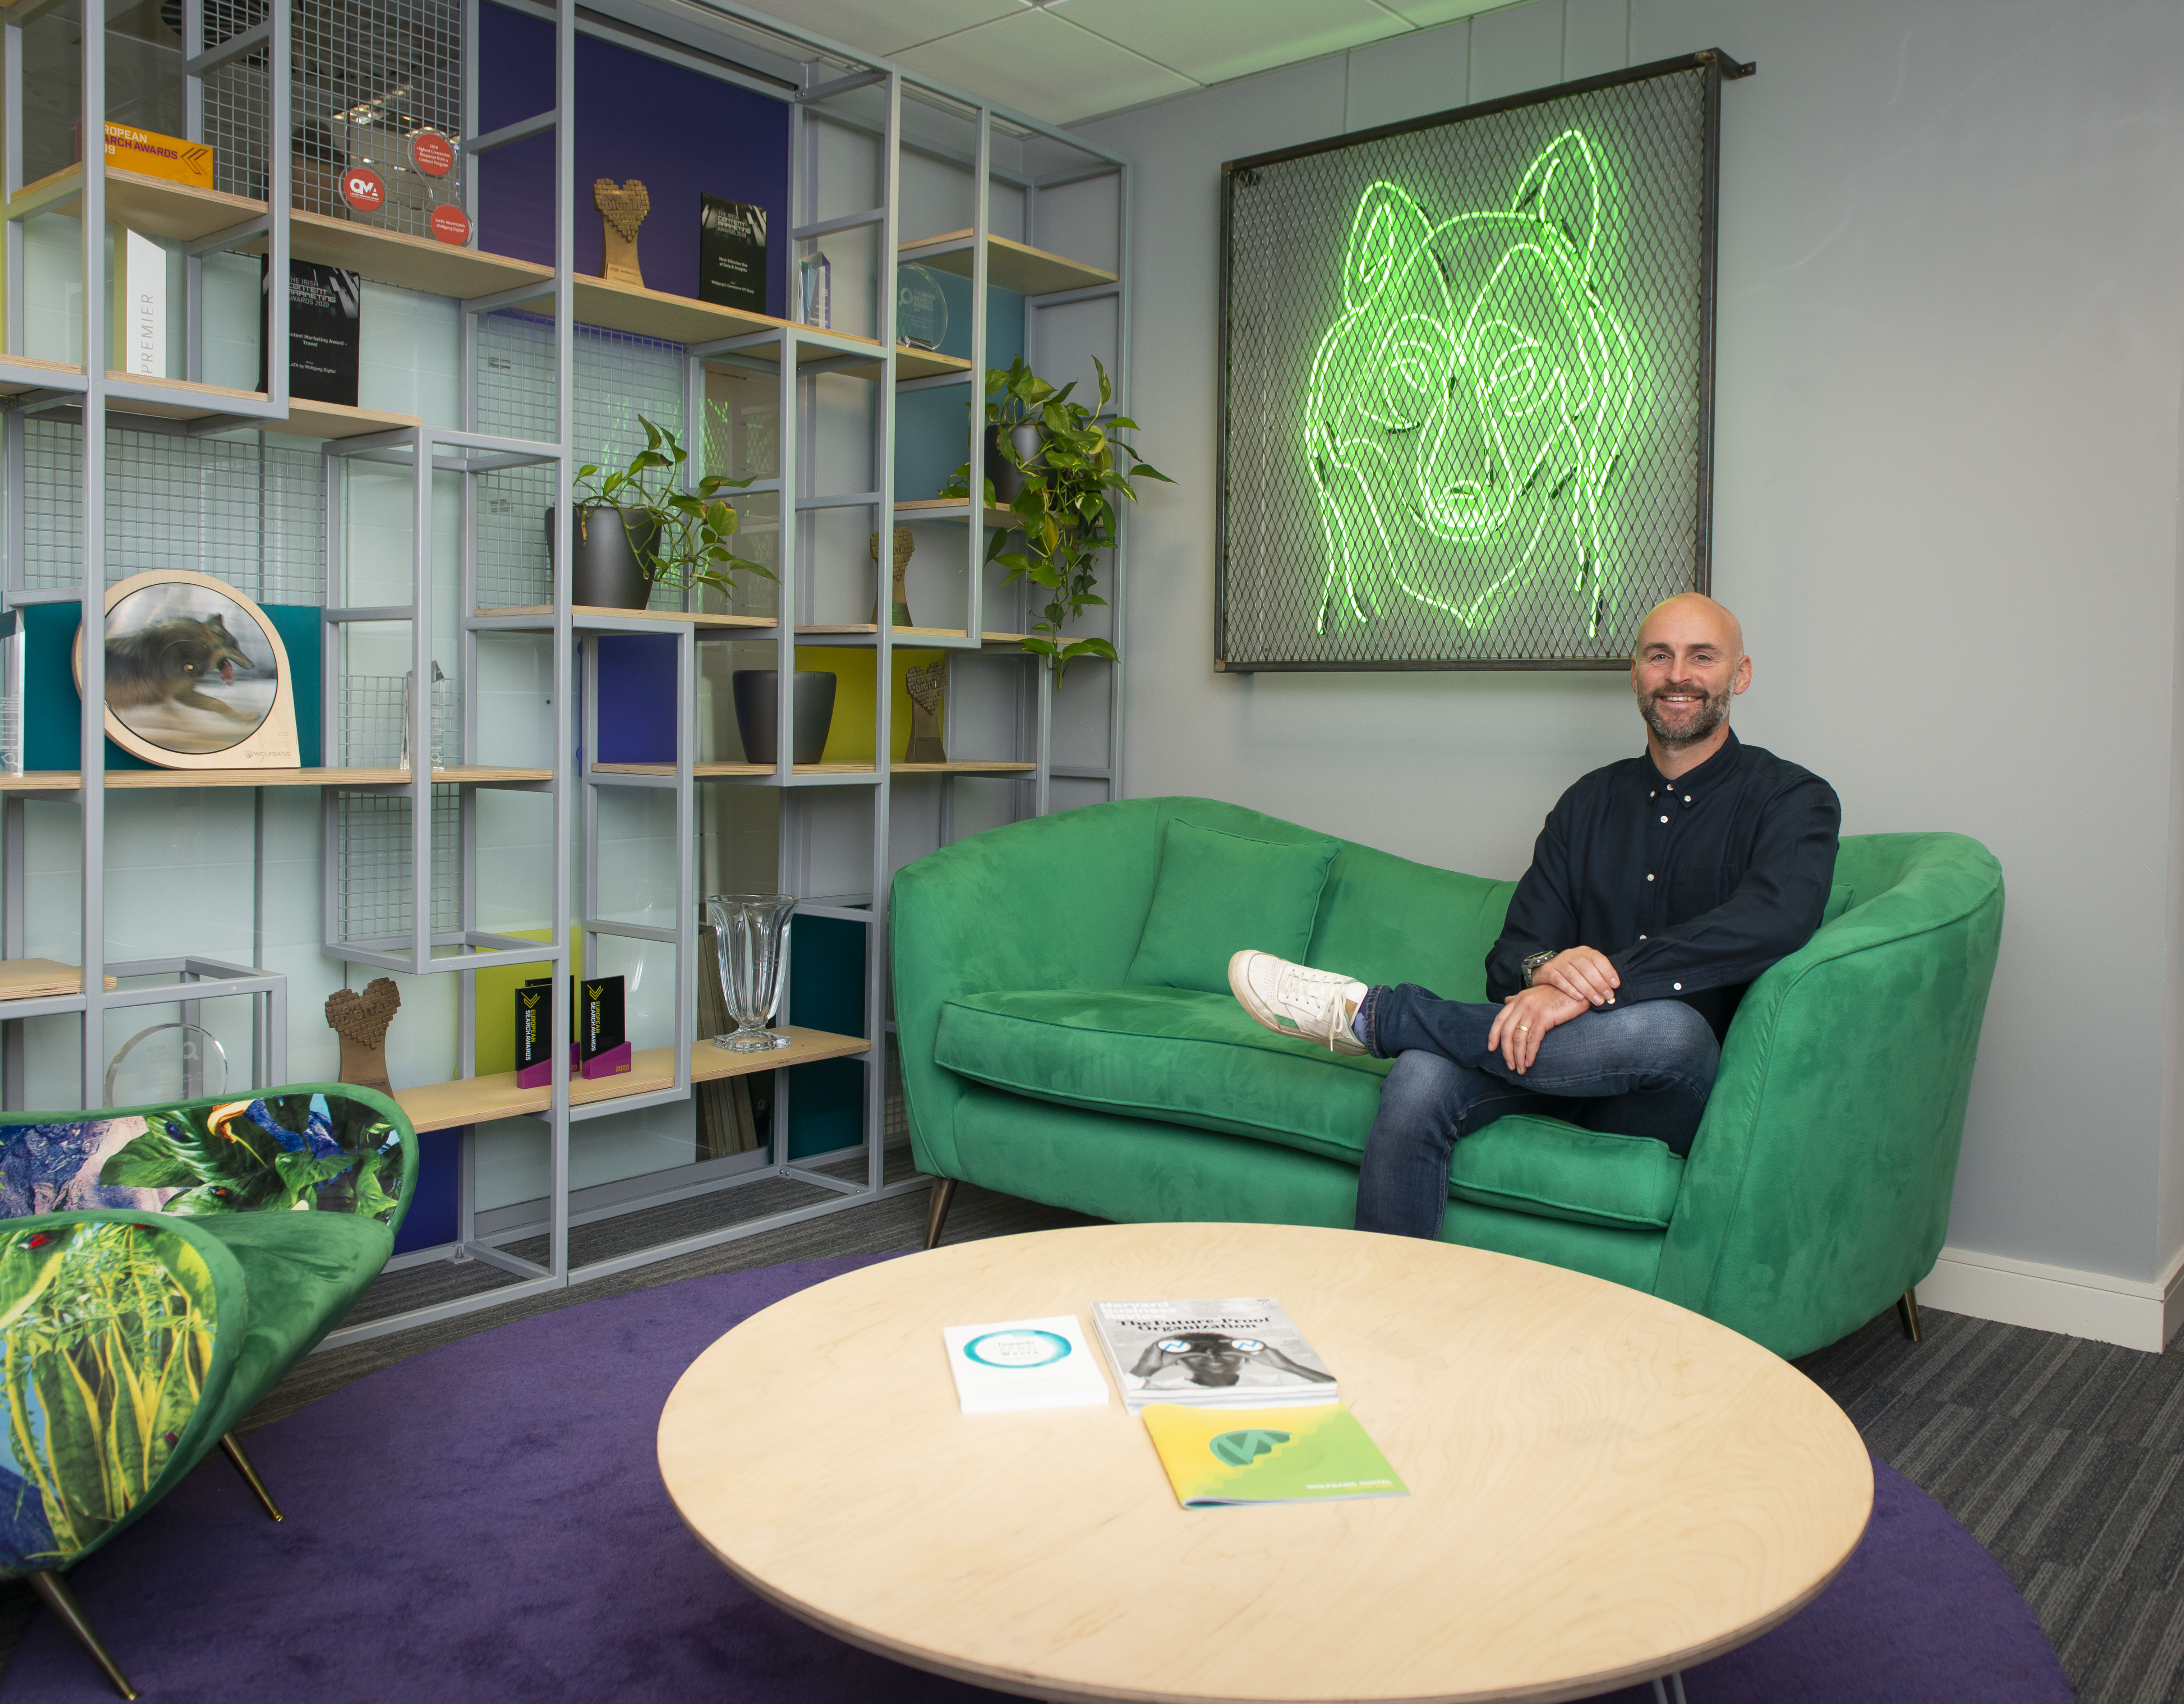 Alan Coleman Wolfgang Green Sofa